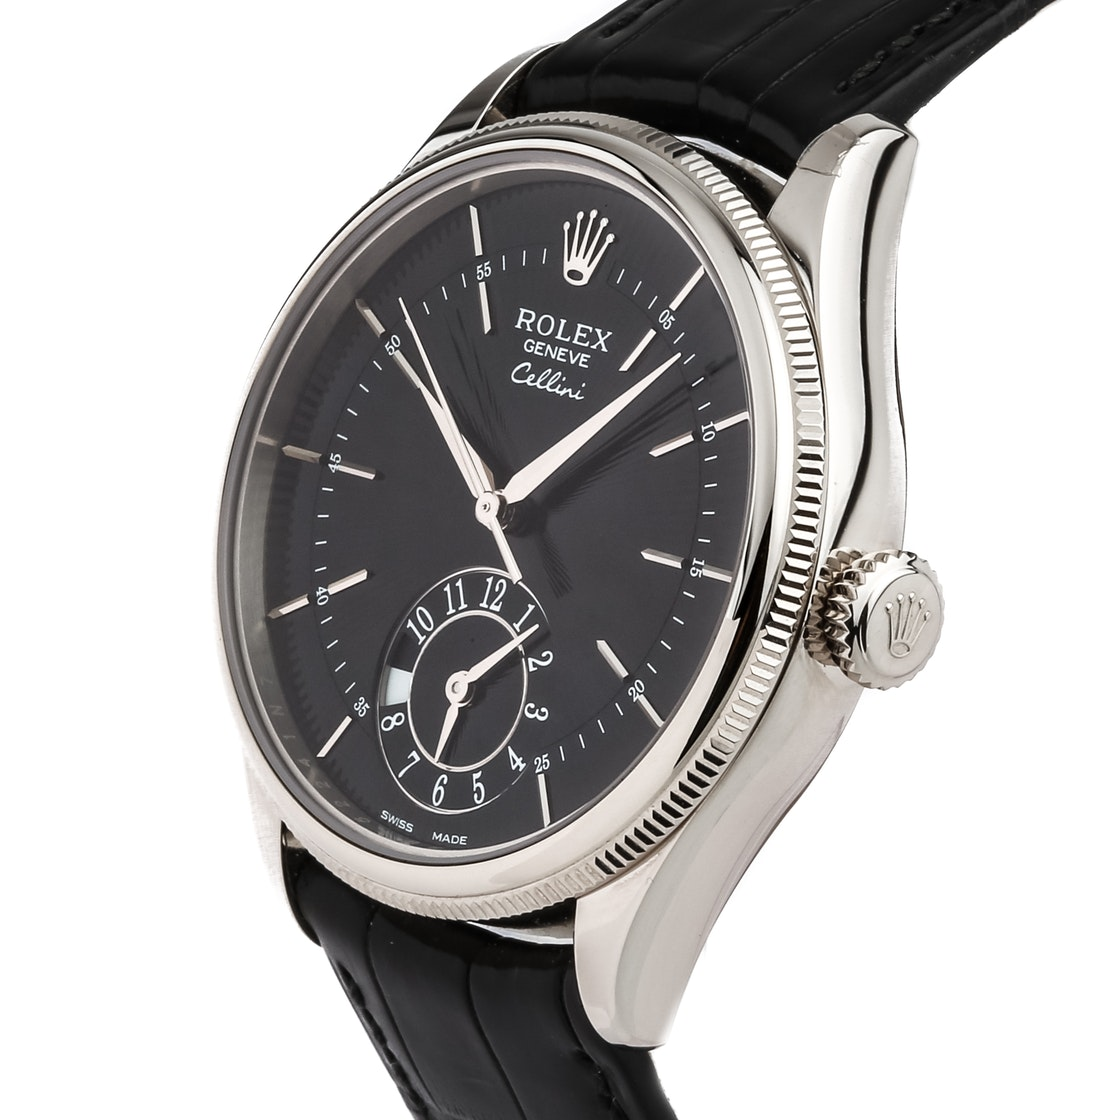 Rolex Cellini Dual Time 50529-007